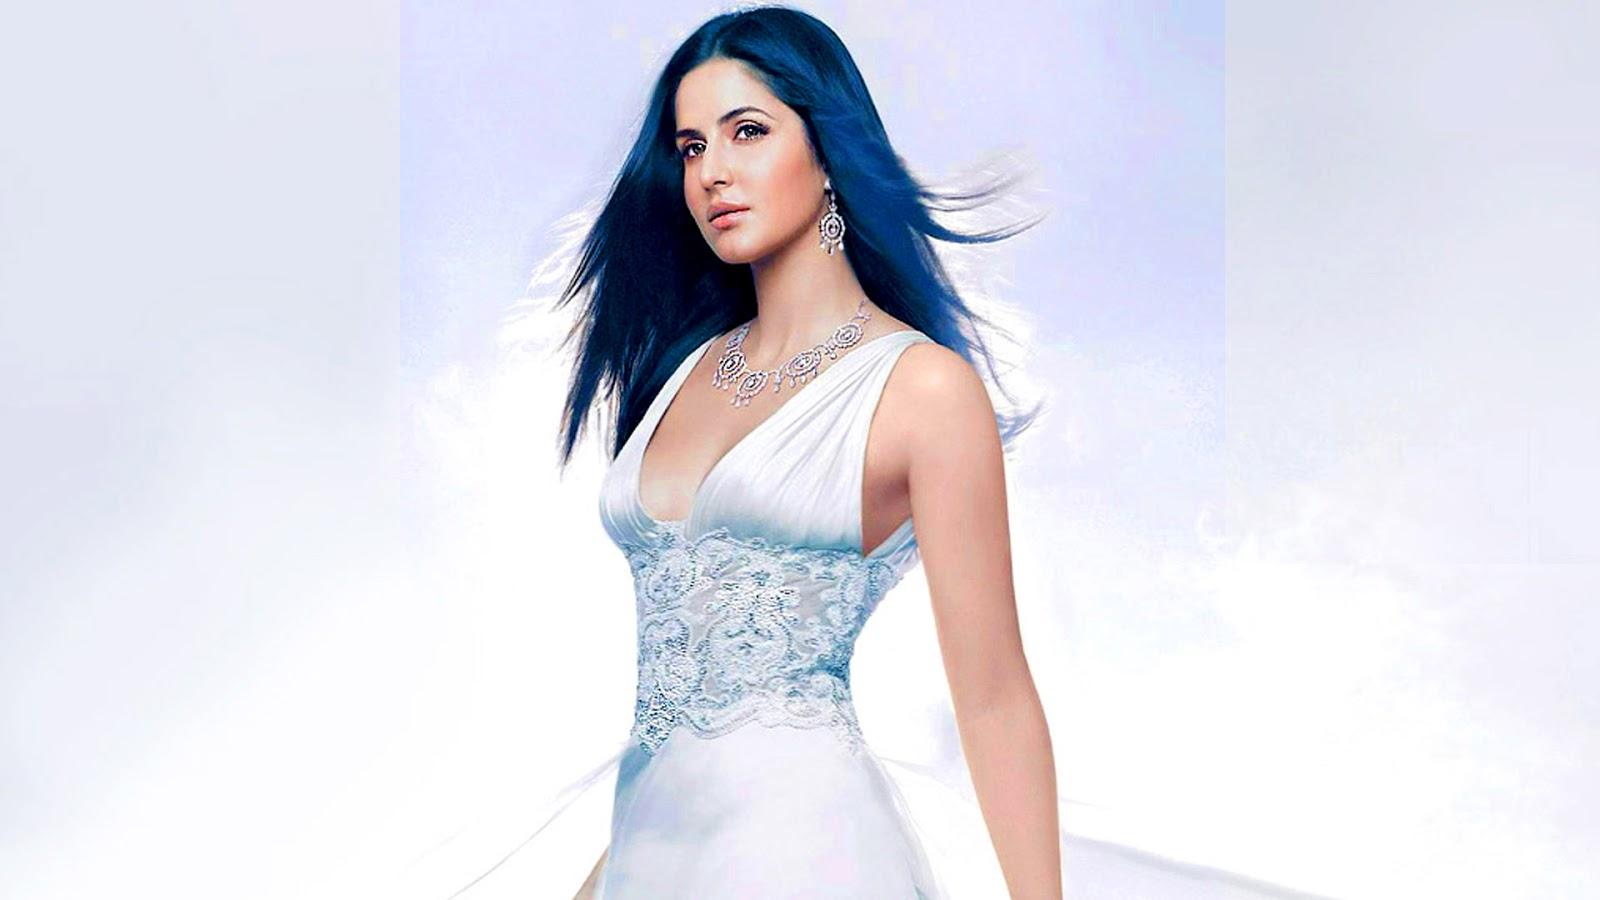 Katrina Kaif Hot Back Pic - Katrina Kaif Bollywood Hungama , HD Wallpaper & Backgrounds